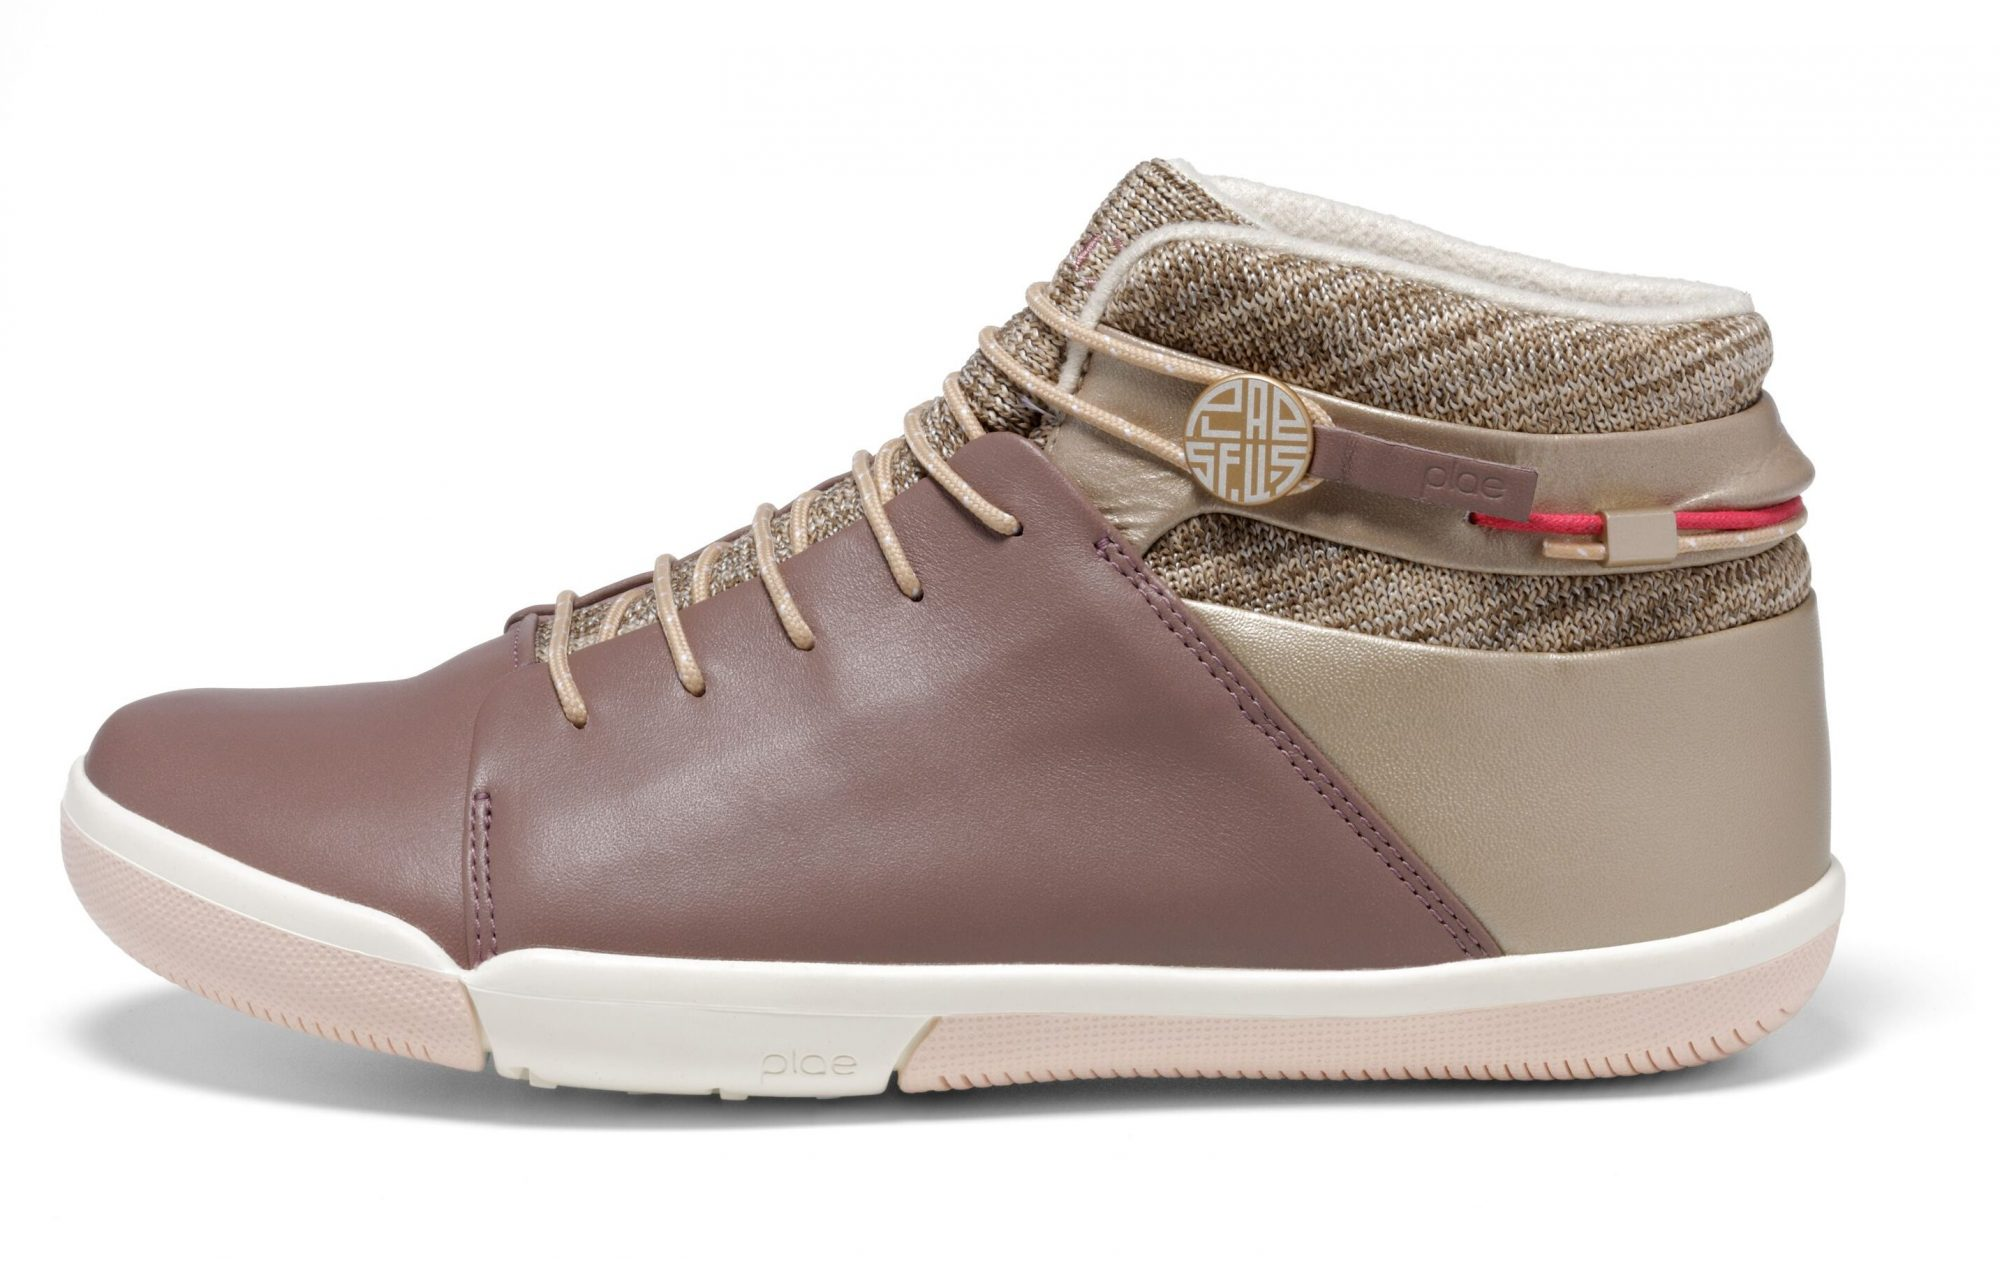 wateproof-footwear-plae-e1555619365447.jpeg